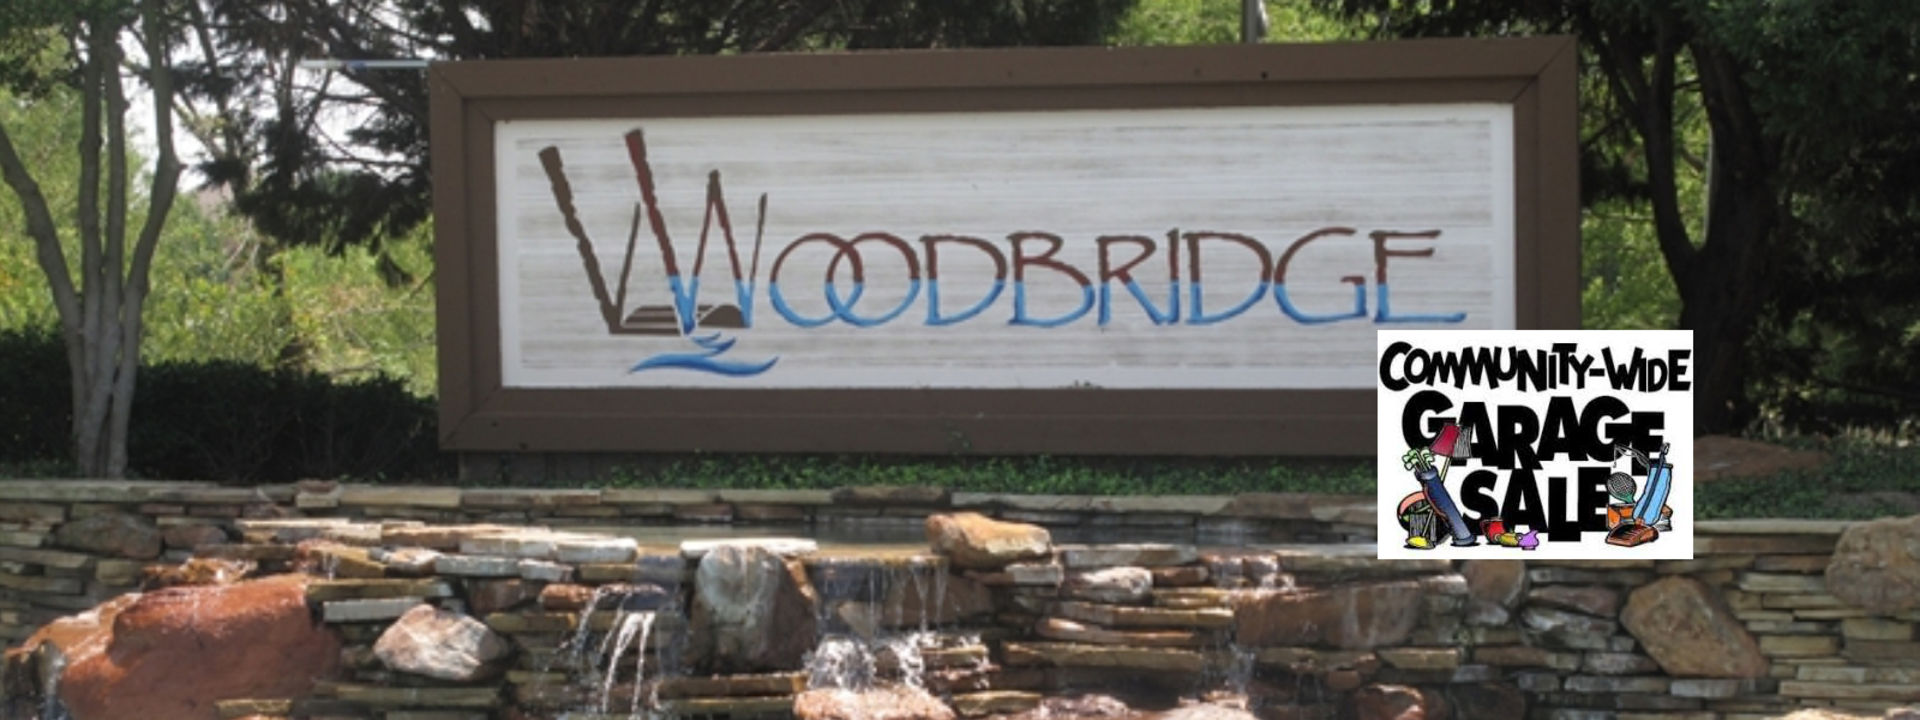 Woodbridge Fall Garage Sale